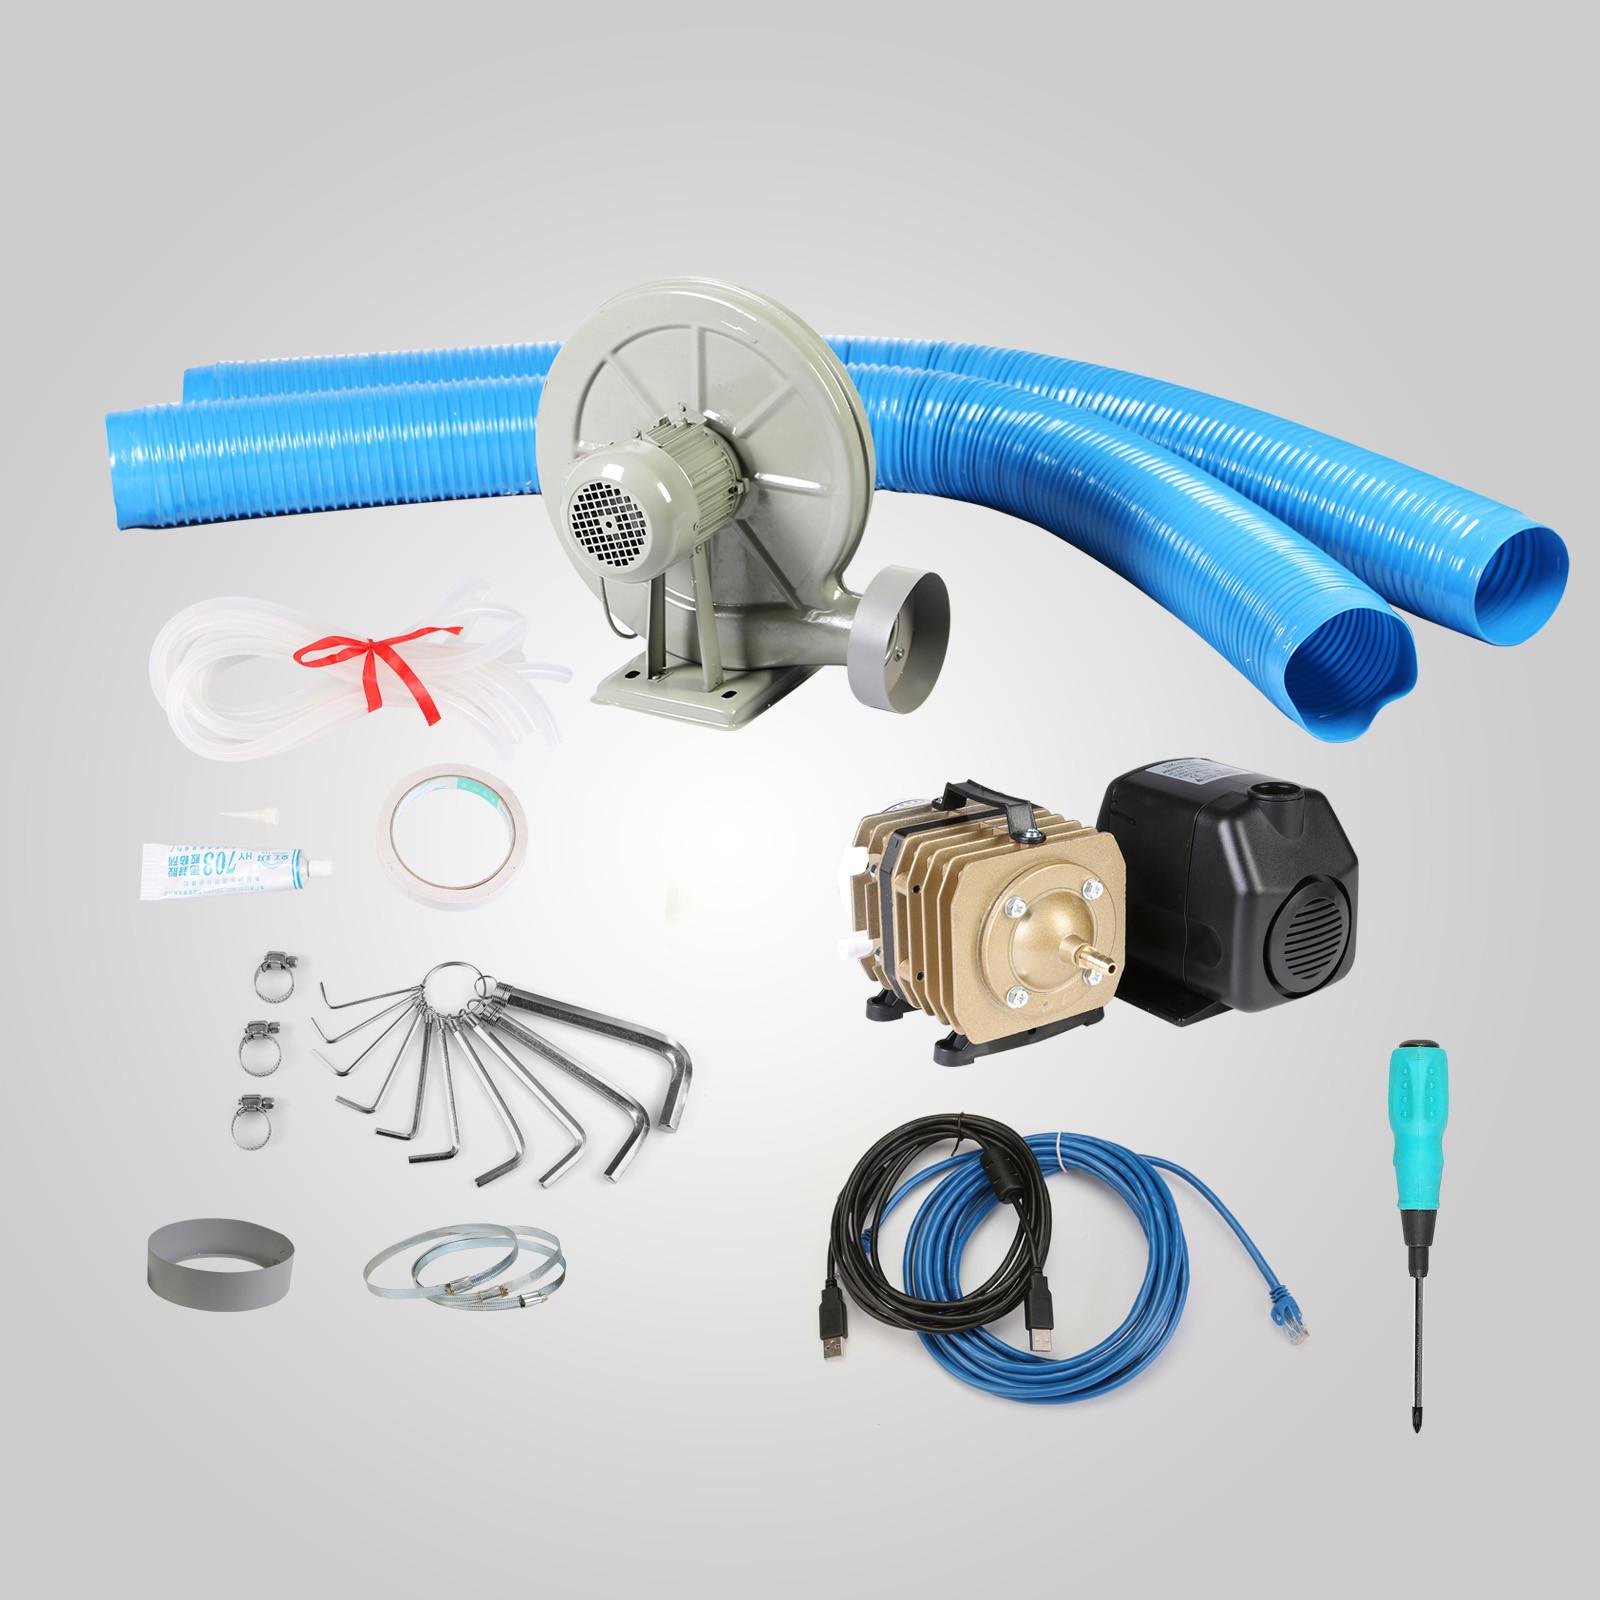 Macchina-per-Incisione-Laser-CO2-40-130W-Asse-Rotante-Tagliatrice-Incisore miniatura 69